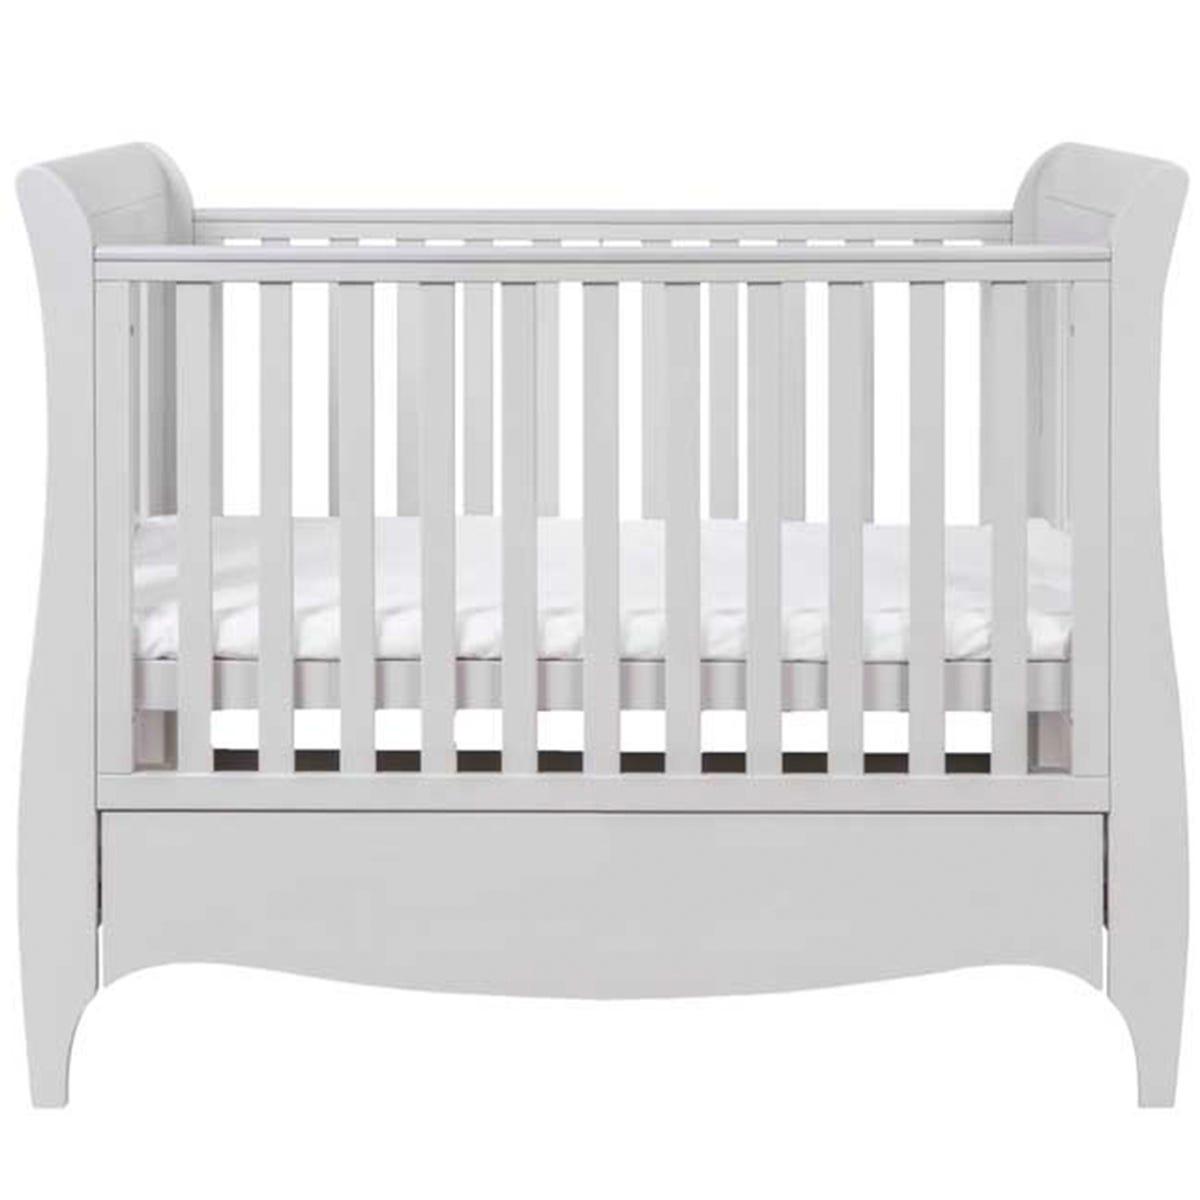 Tutti Bambini Roma Mini Sleigh Cot Bed with Drawer - Dove Grey